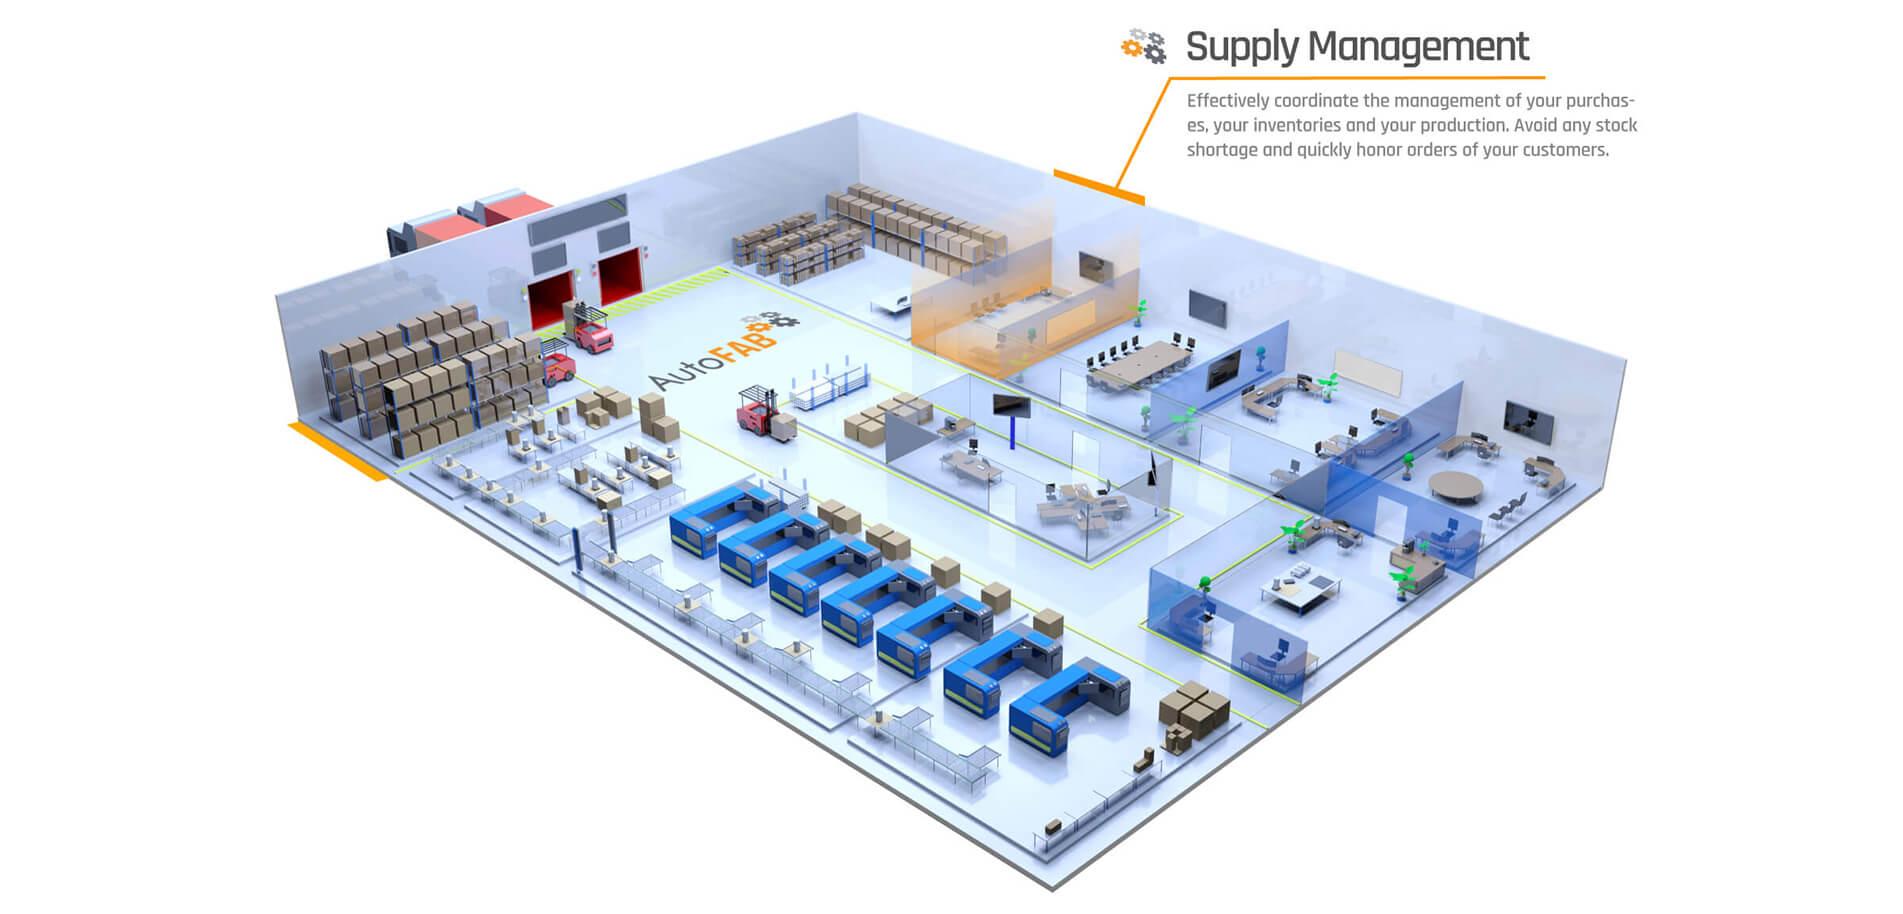 autofab manufacturing Supply